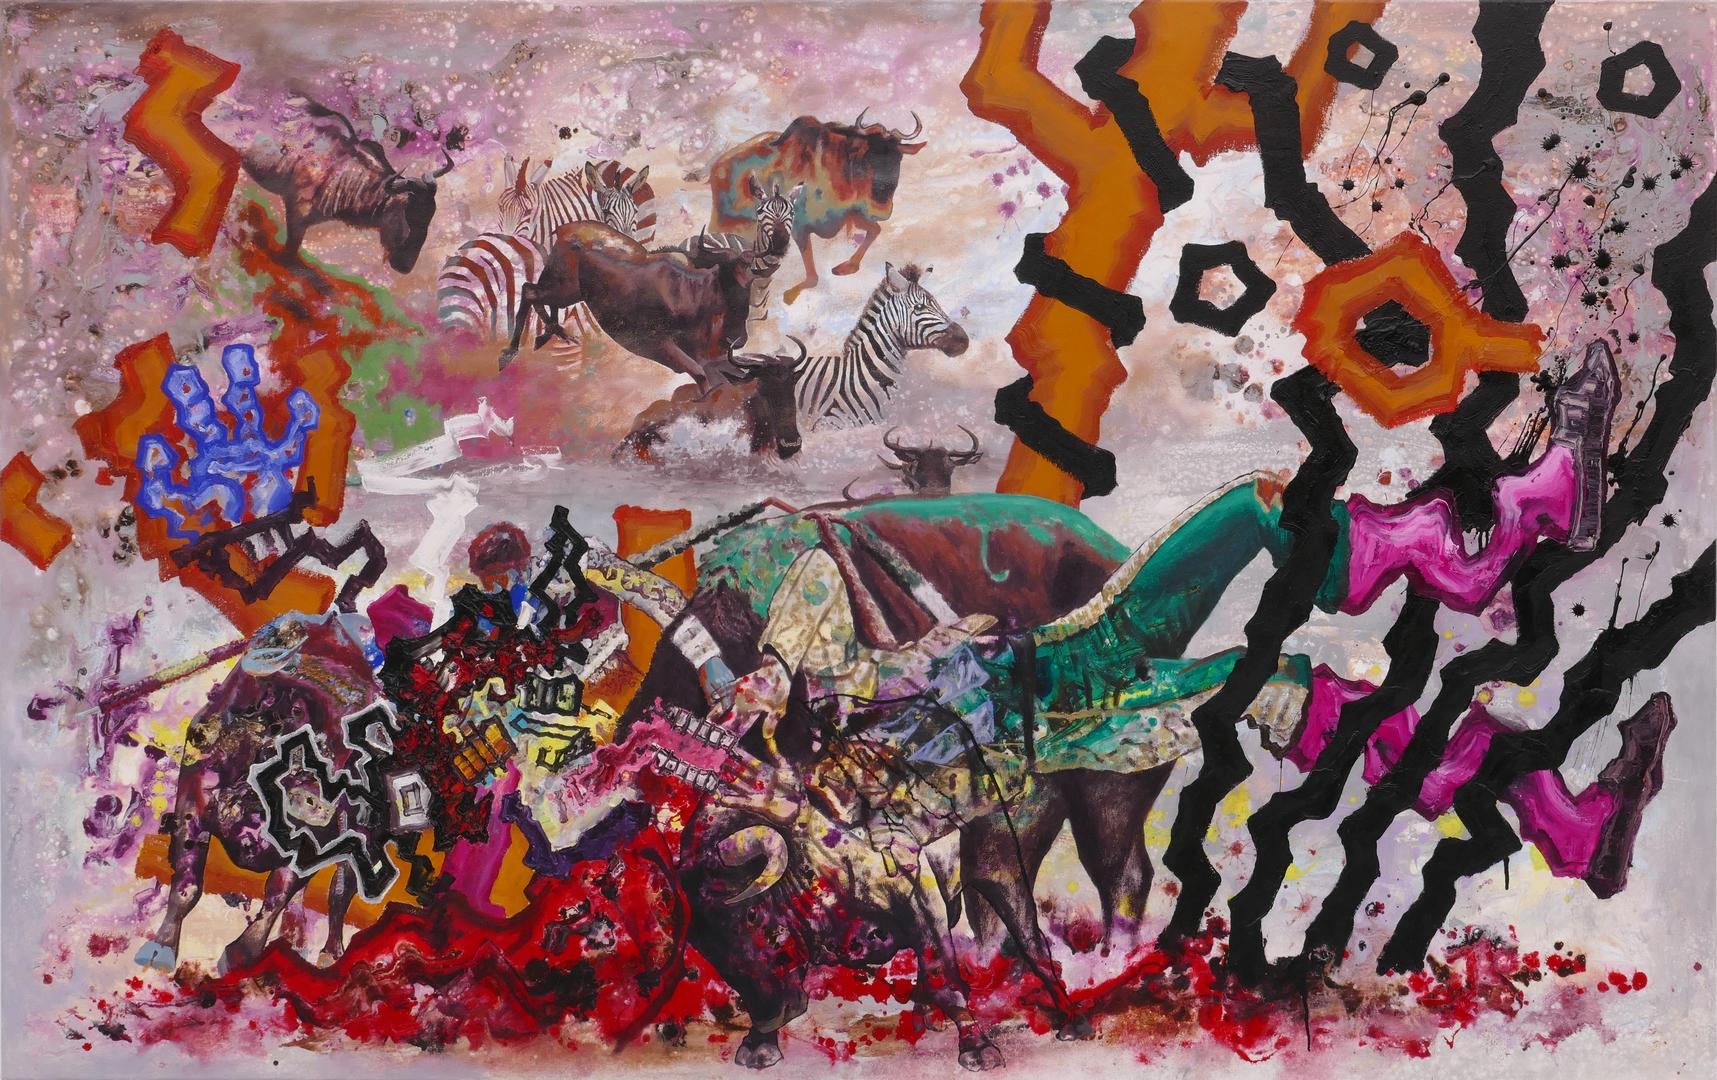 B, Verlorener Stierkaempfer, 120x190cm, Öl, Acryl auf Leinwand,2021